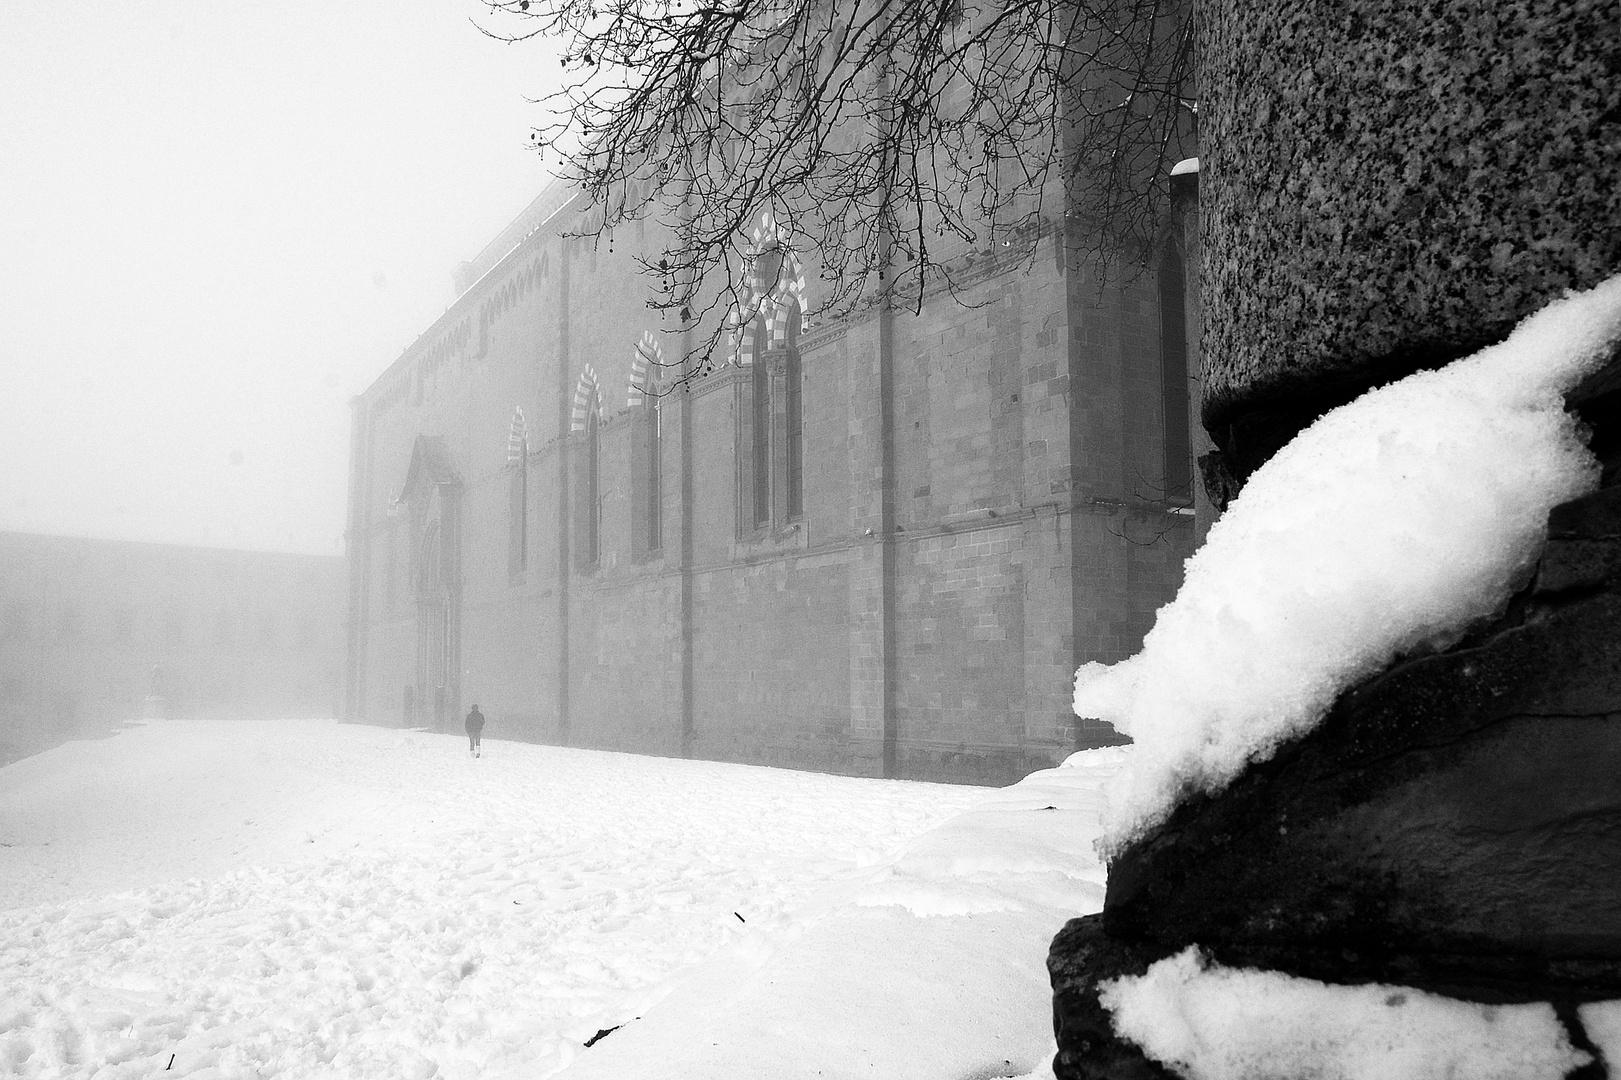 Neve ad Arezzo